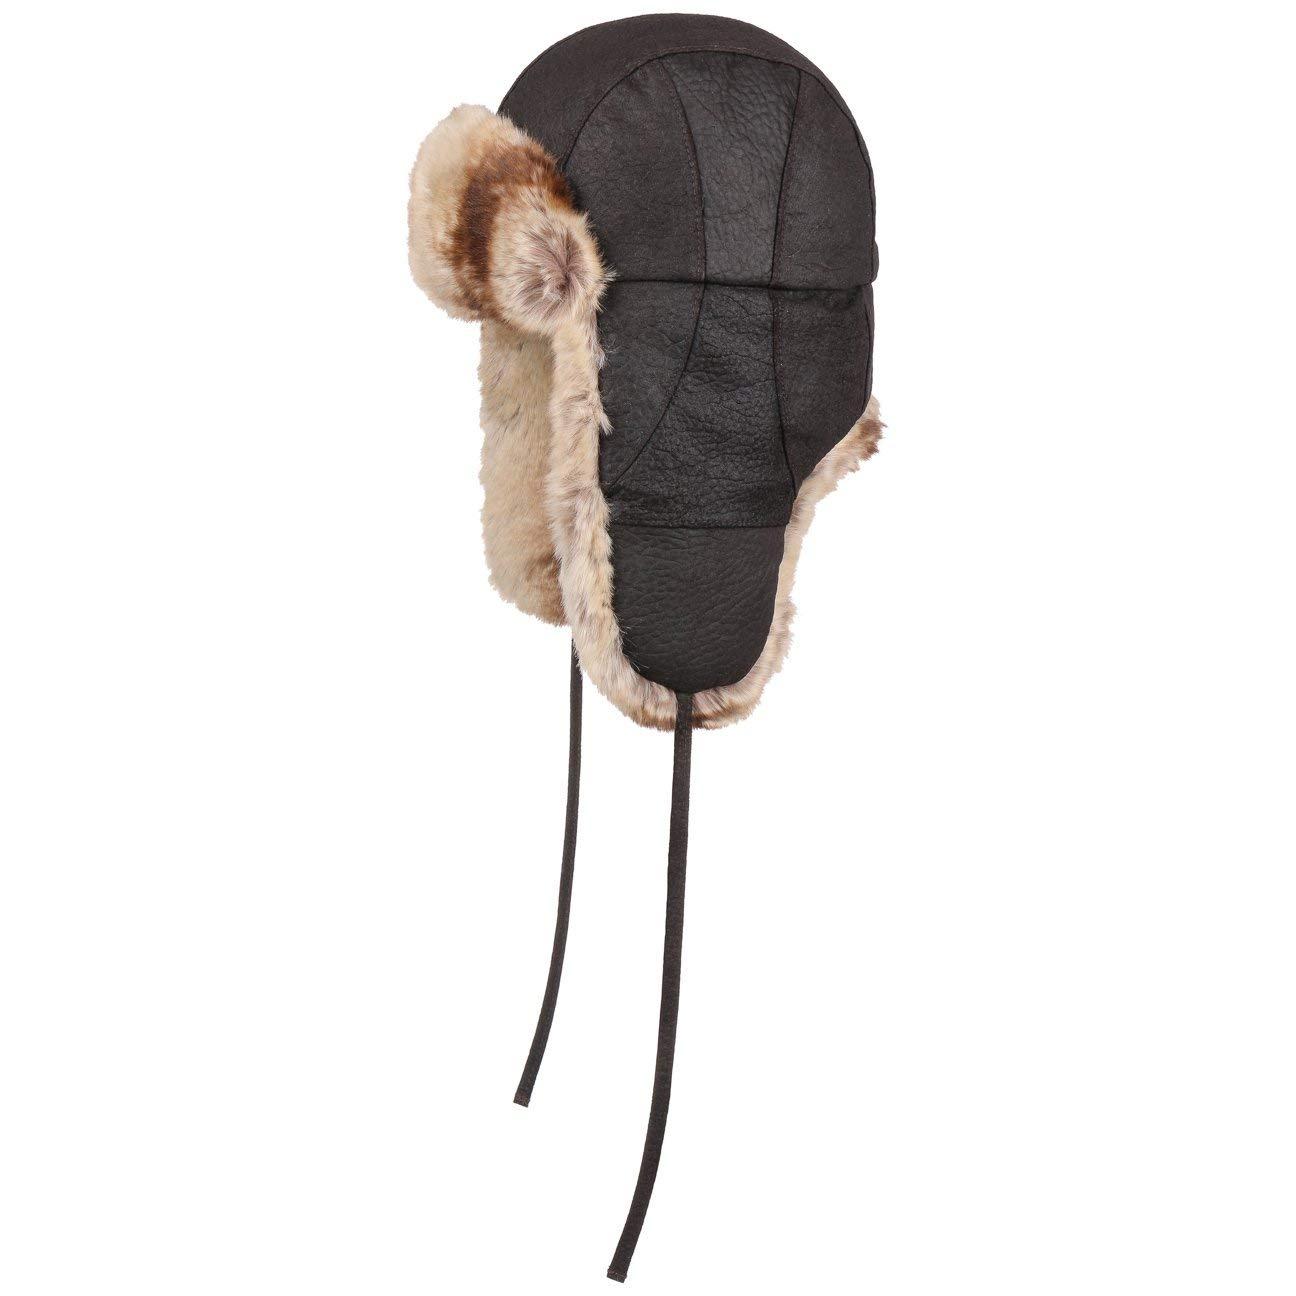 Stetson Shrunken Pigskin Aviator Hat Winter (L (58-59 cm) - Dark Brown)   Amazon.co.uk  Clothing 21cd192eea7c